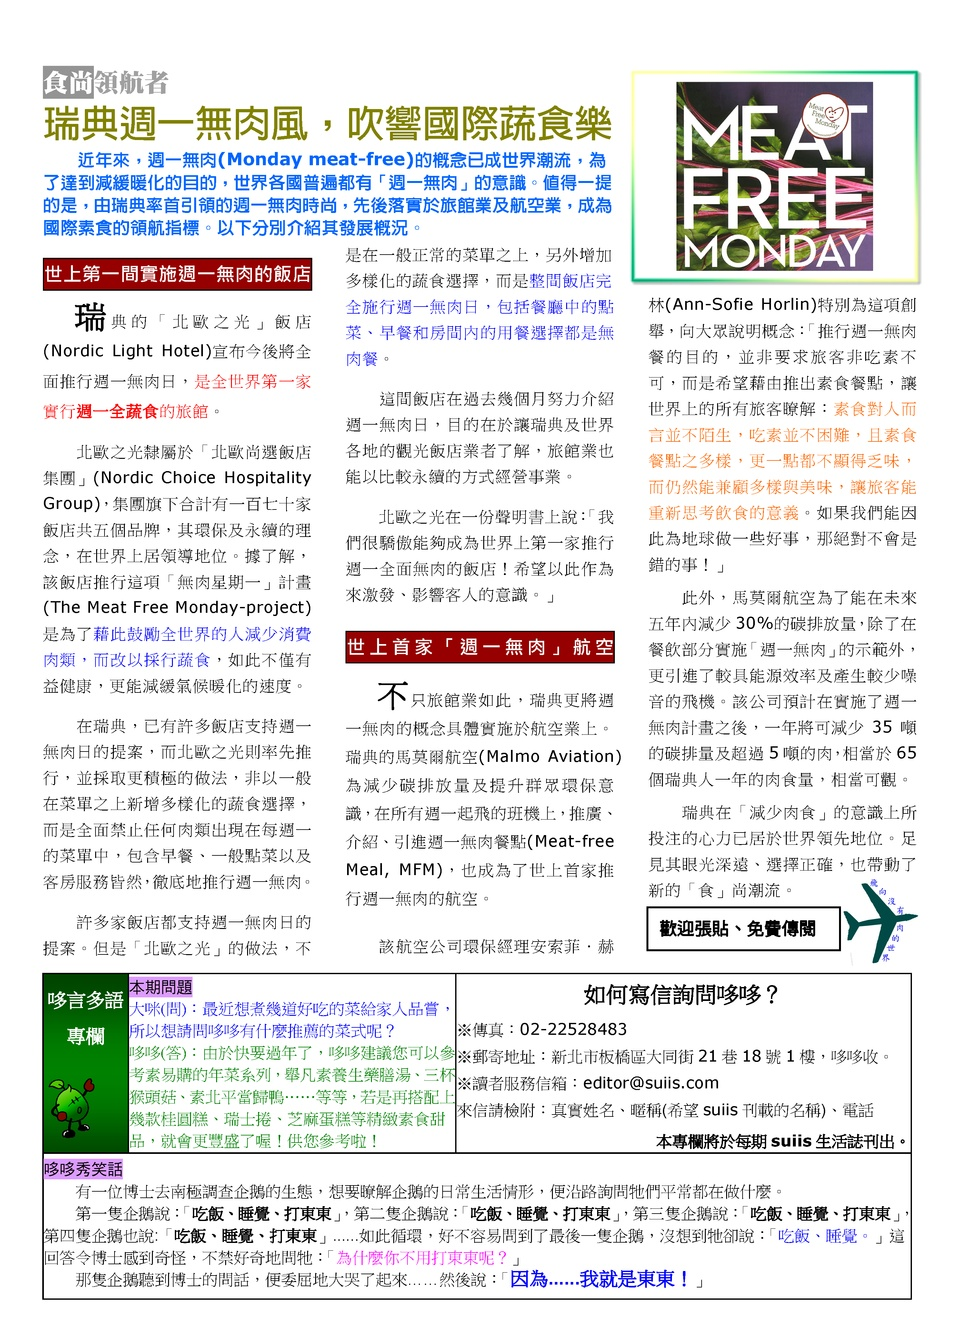 suiis 生活誌-2011-12_Page_2